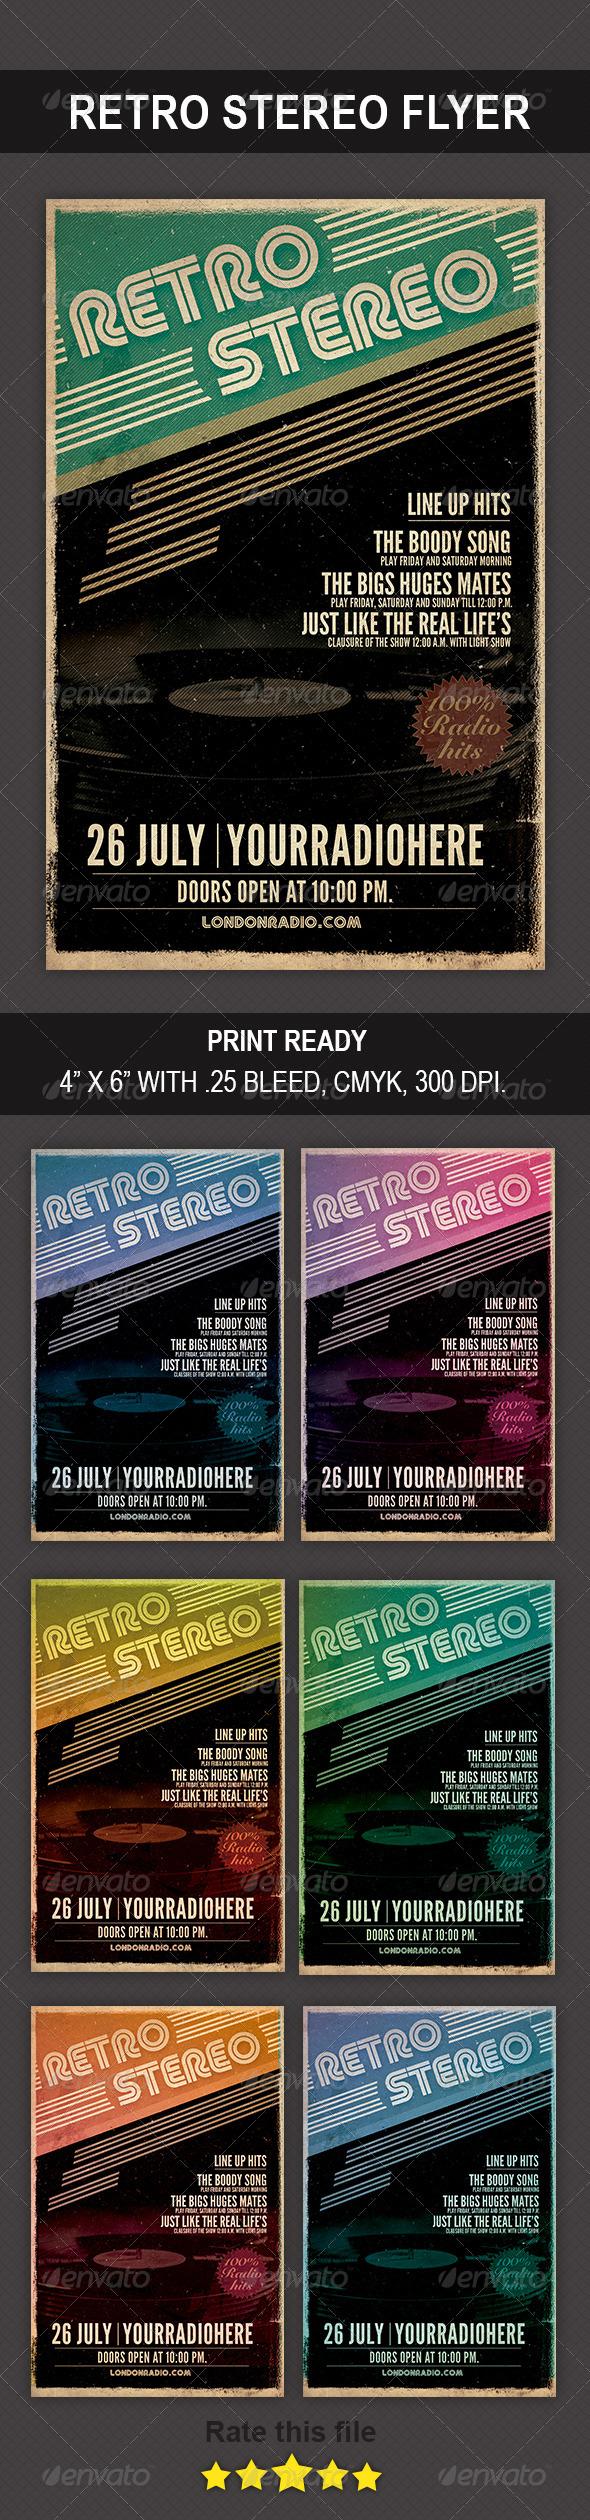 Retro Stereo Flyer